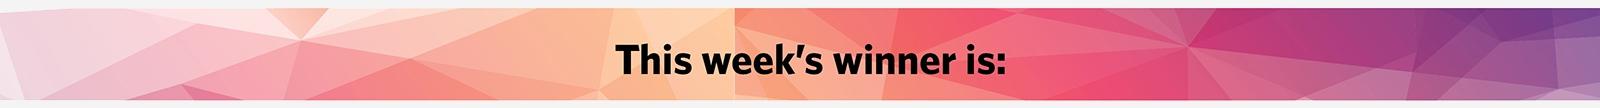 ntna_s4ch3_banner_thisweekbar